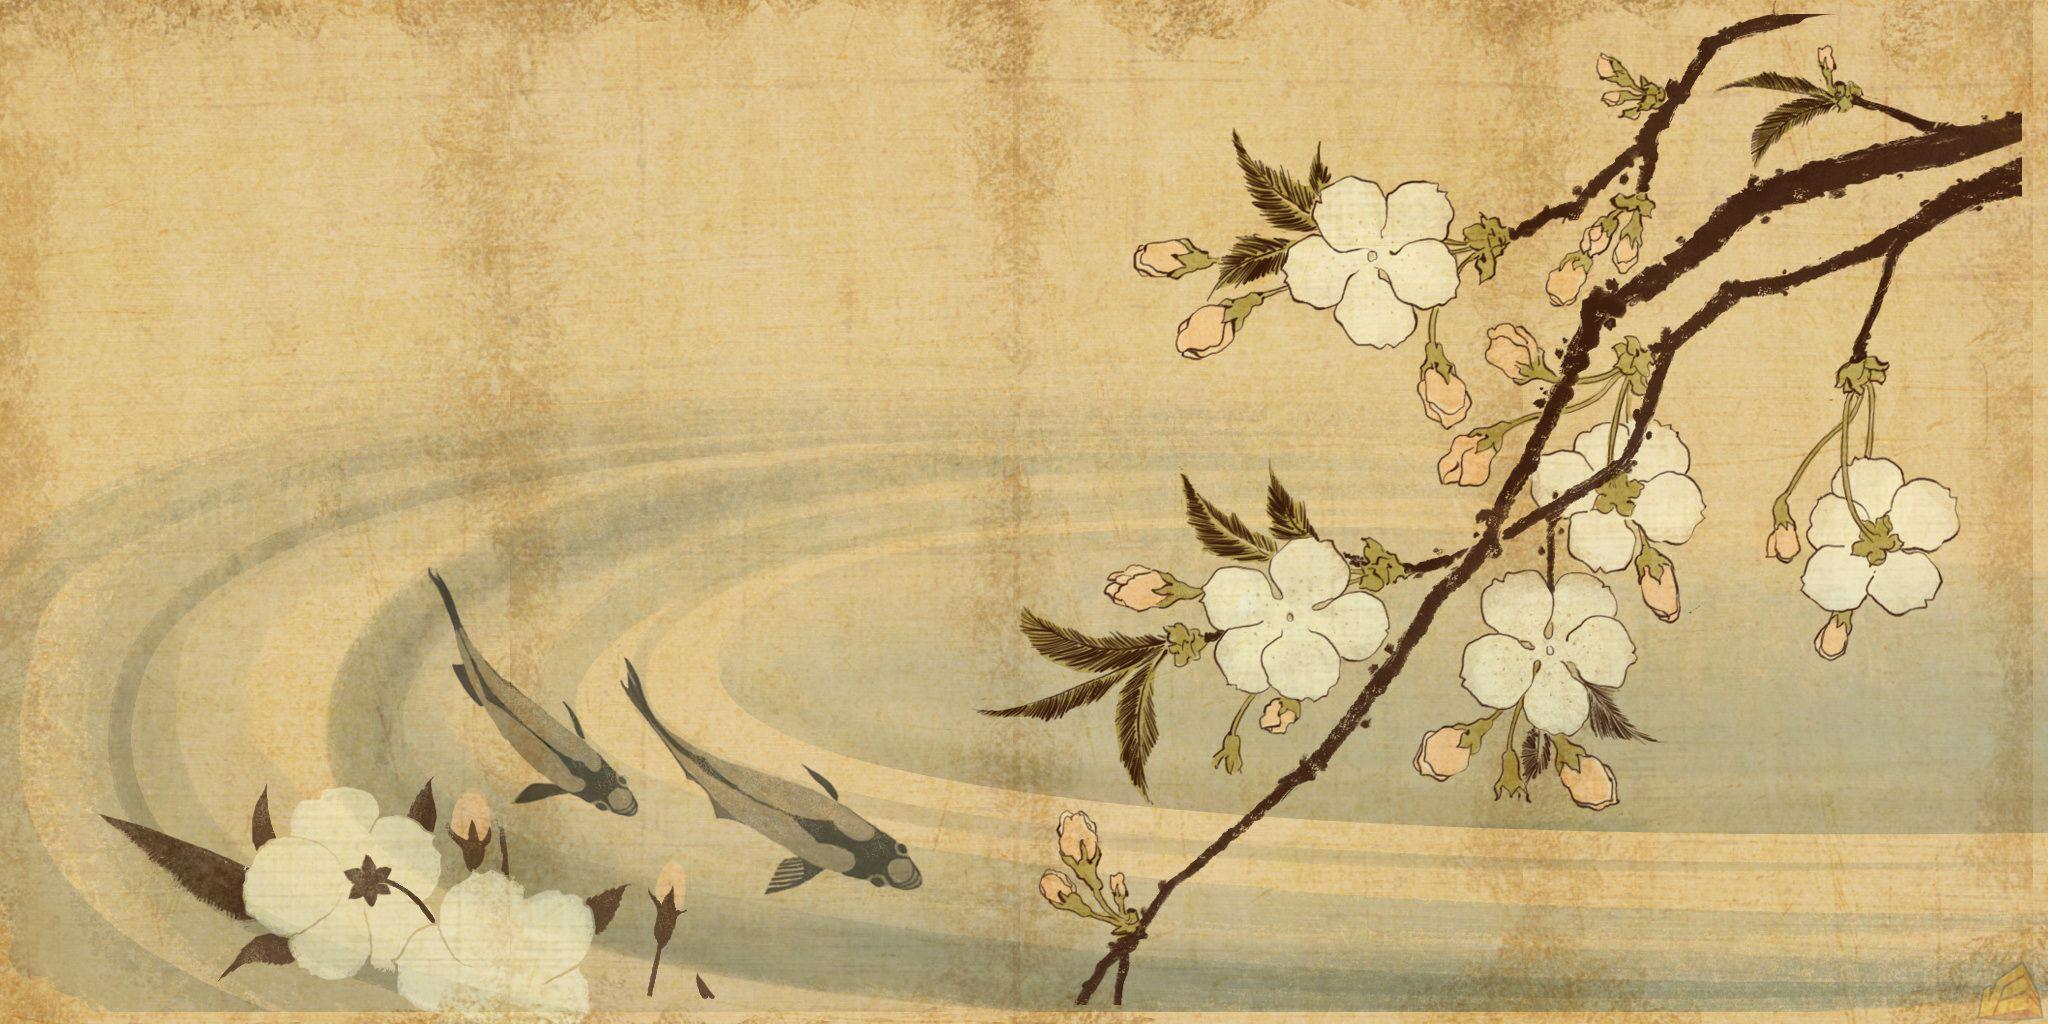 Total War Shogun 2 Fall Of The Samurai Wallpaper Hd Shogun 2 Art Wallpapers 2048x1024 370036